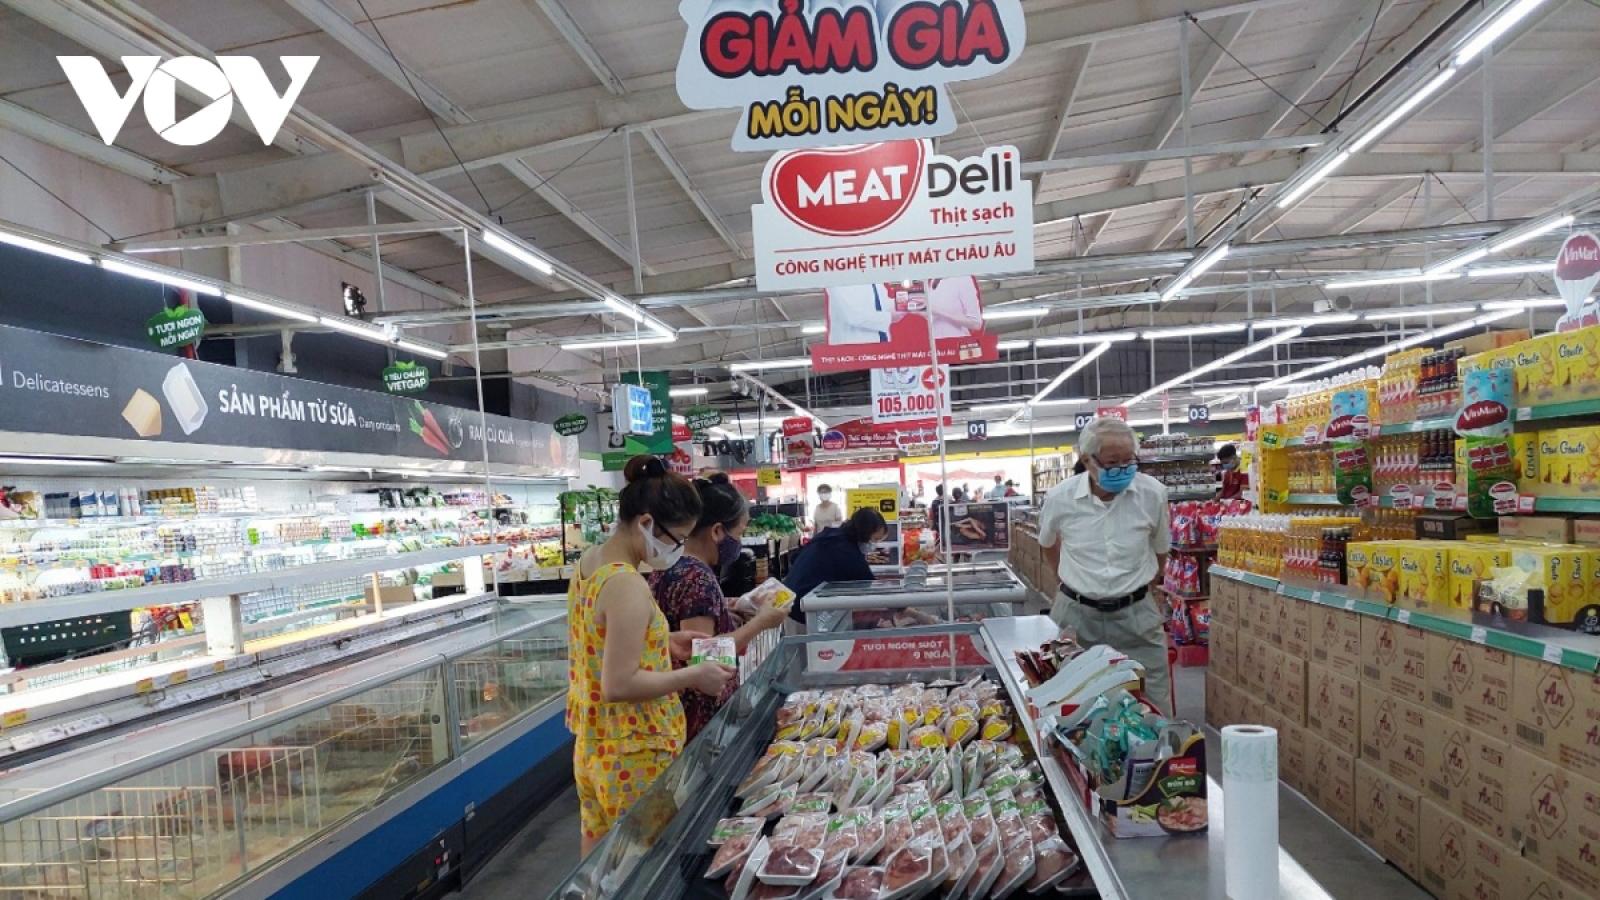 Hanoi: Wet markets crowded, supermarkets not busy amid COVID-19 fight